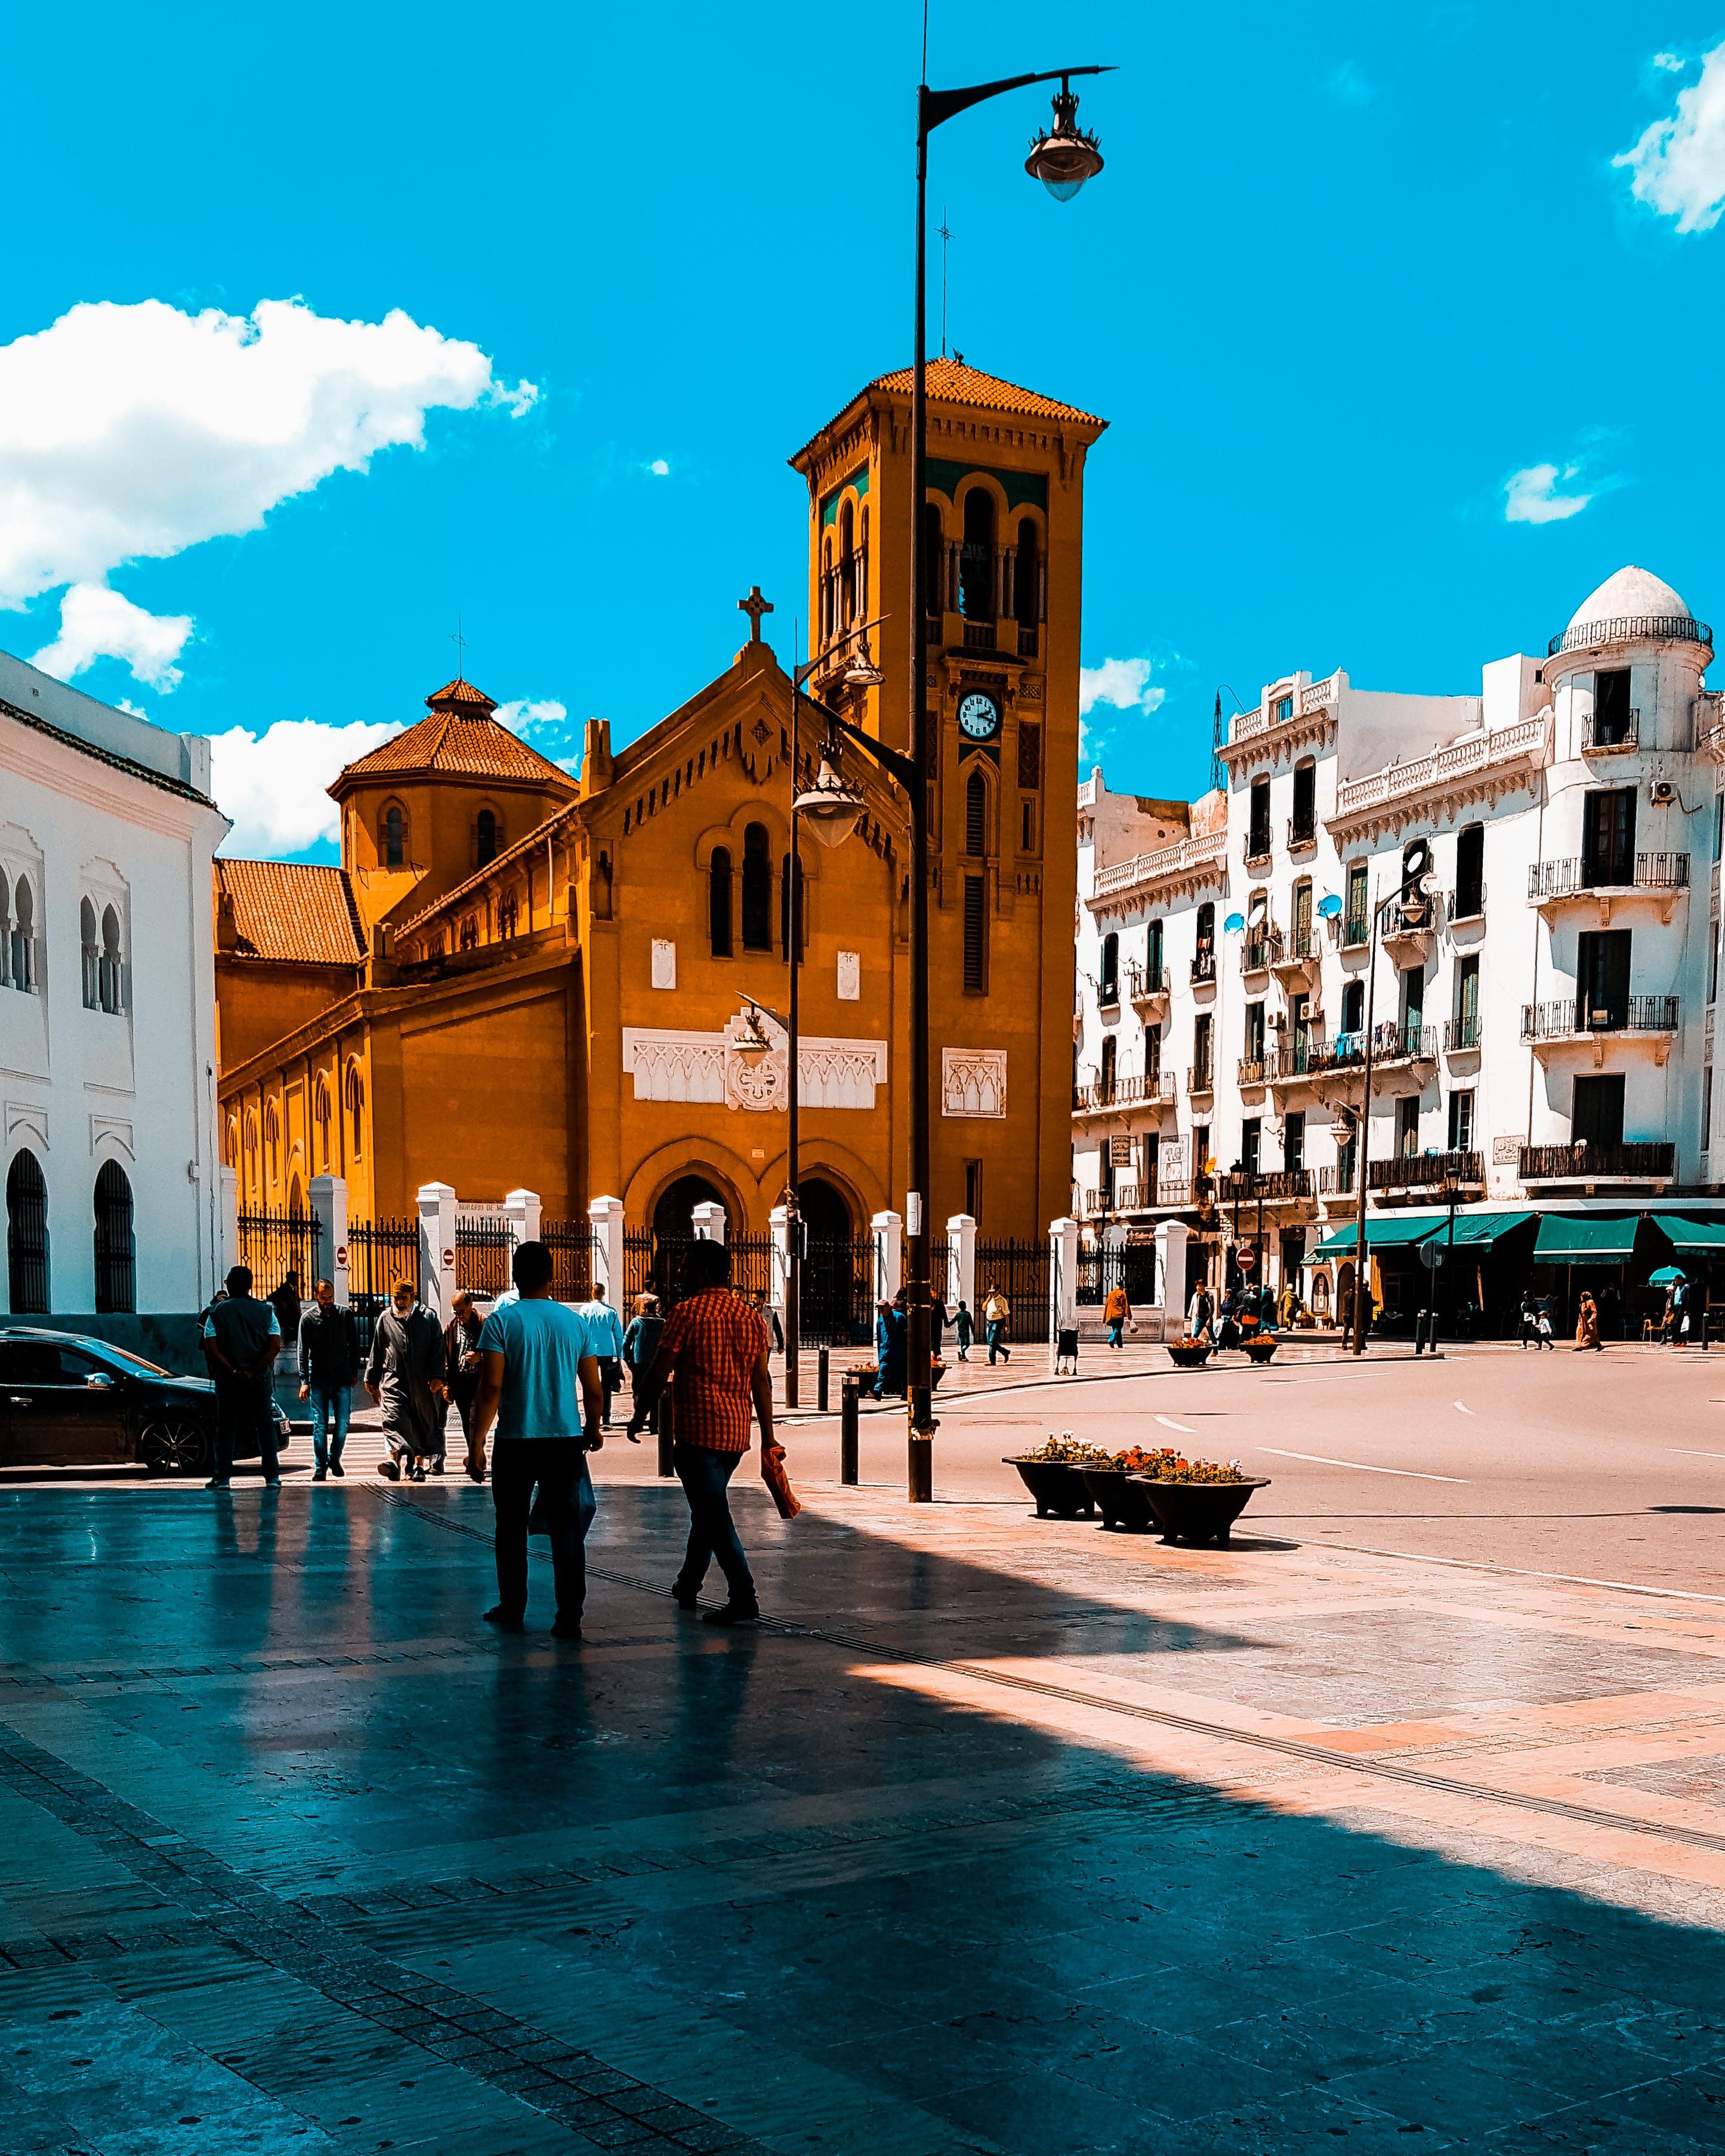 People Walking on Sidewalk Near Brown Cathedral